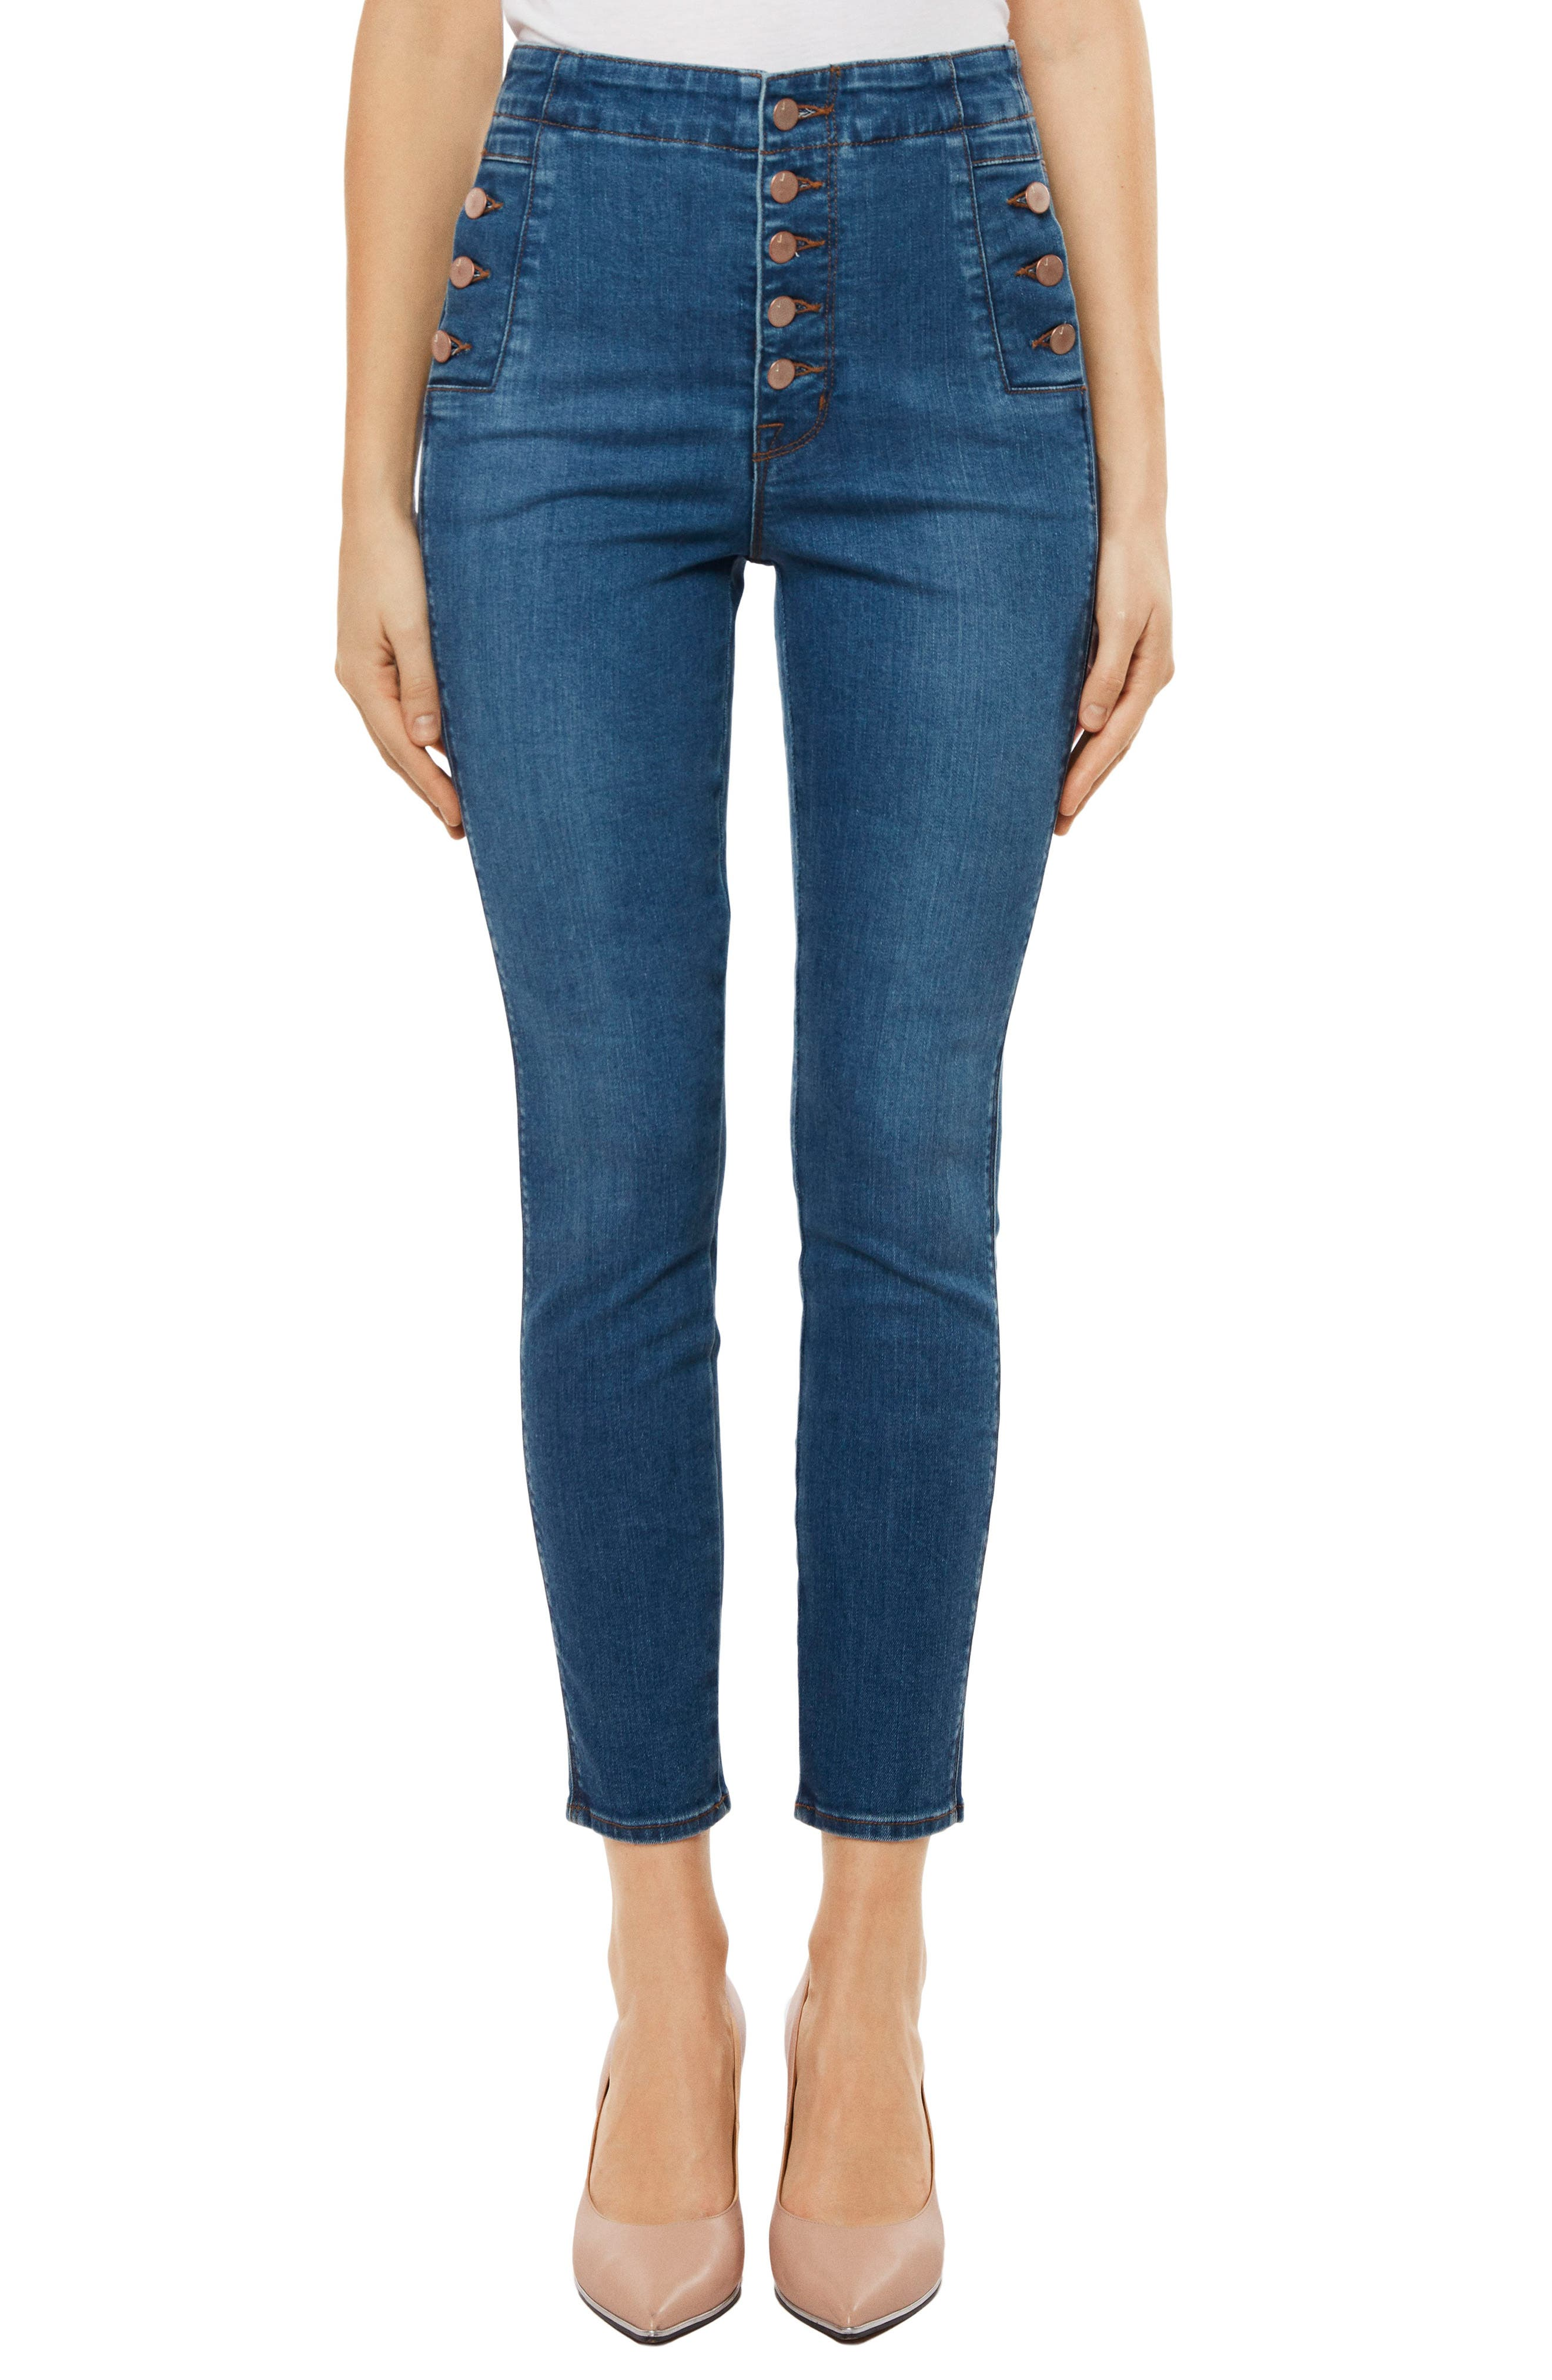 Natasha Sky High High Waist Crop Skinny Jeans,                         Main,                         color, LOVESICK